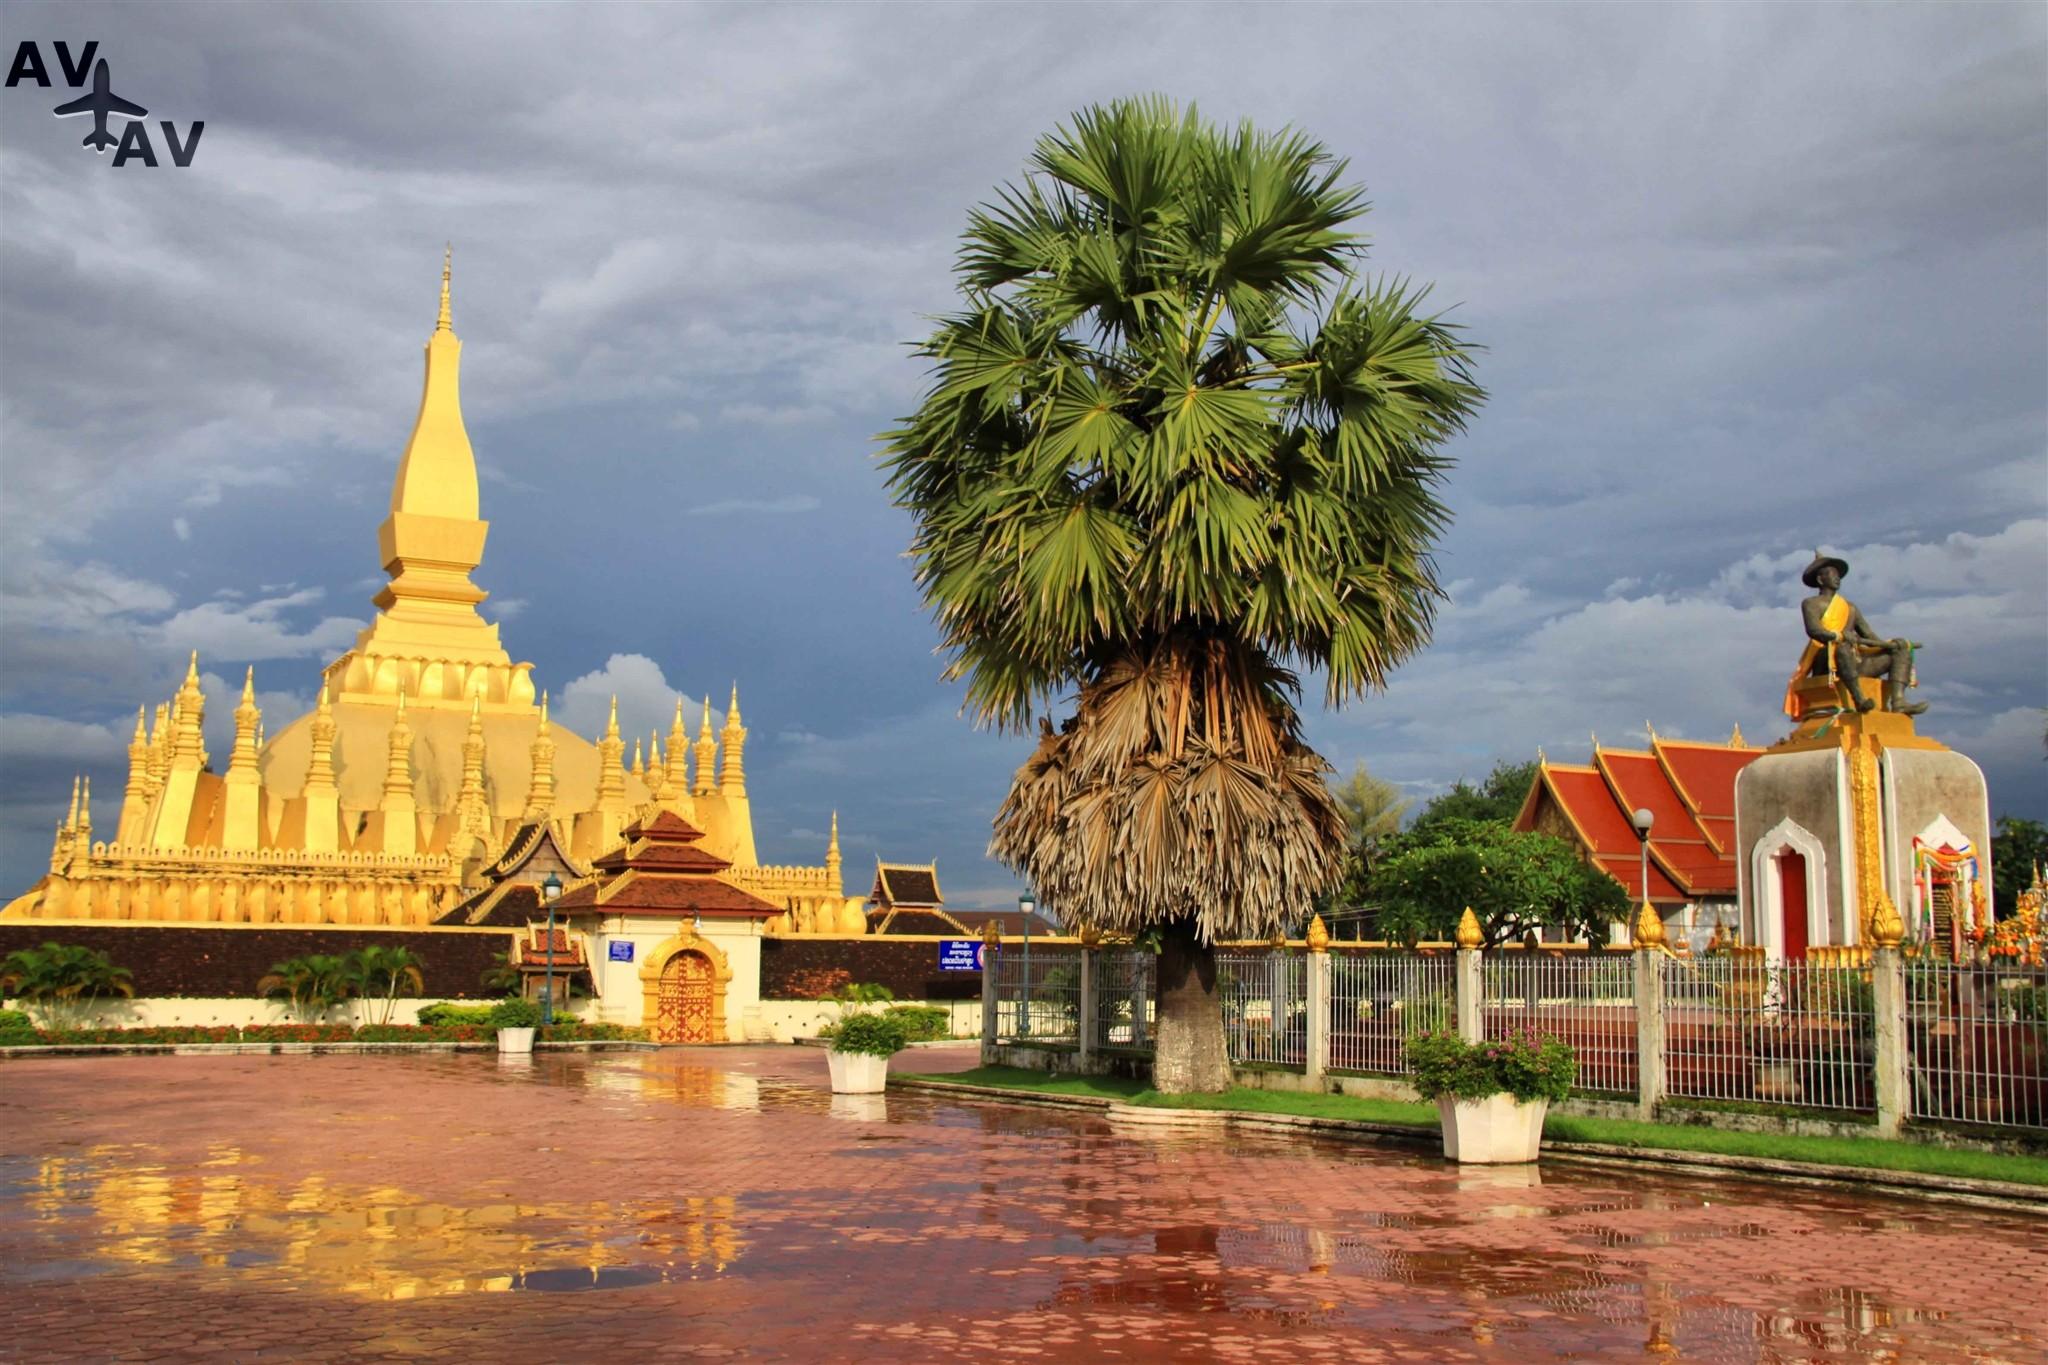 Tayskaya viza v Laose - Тайская виза в Лаосе